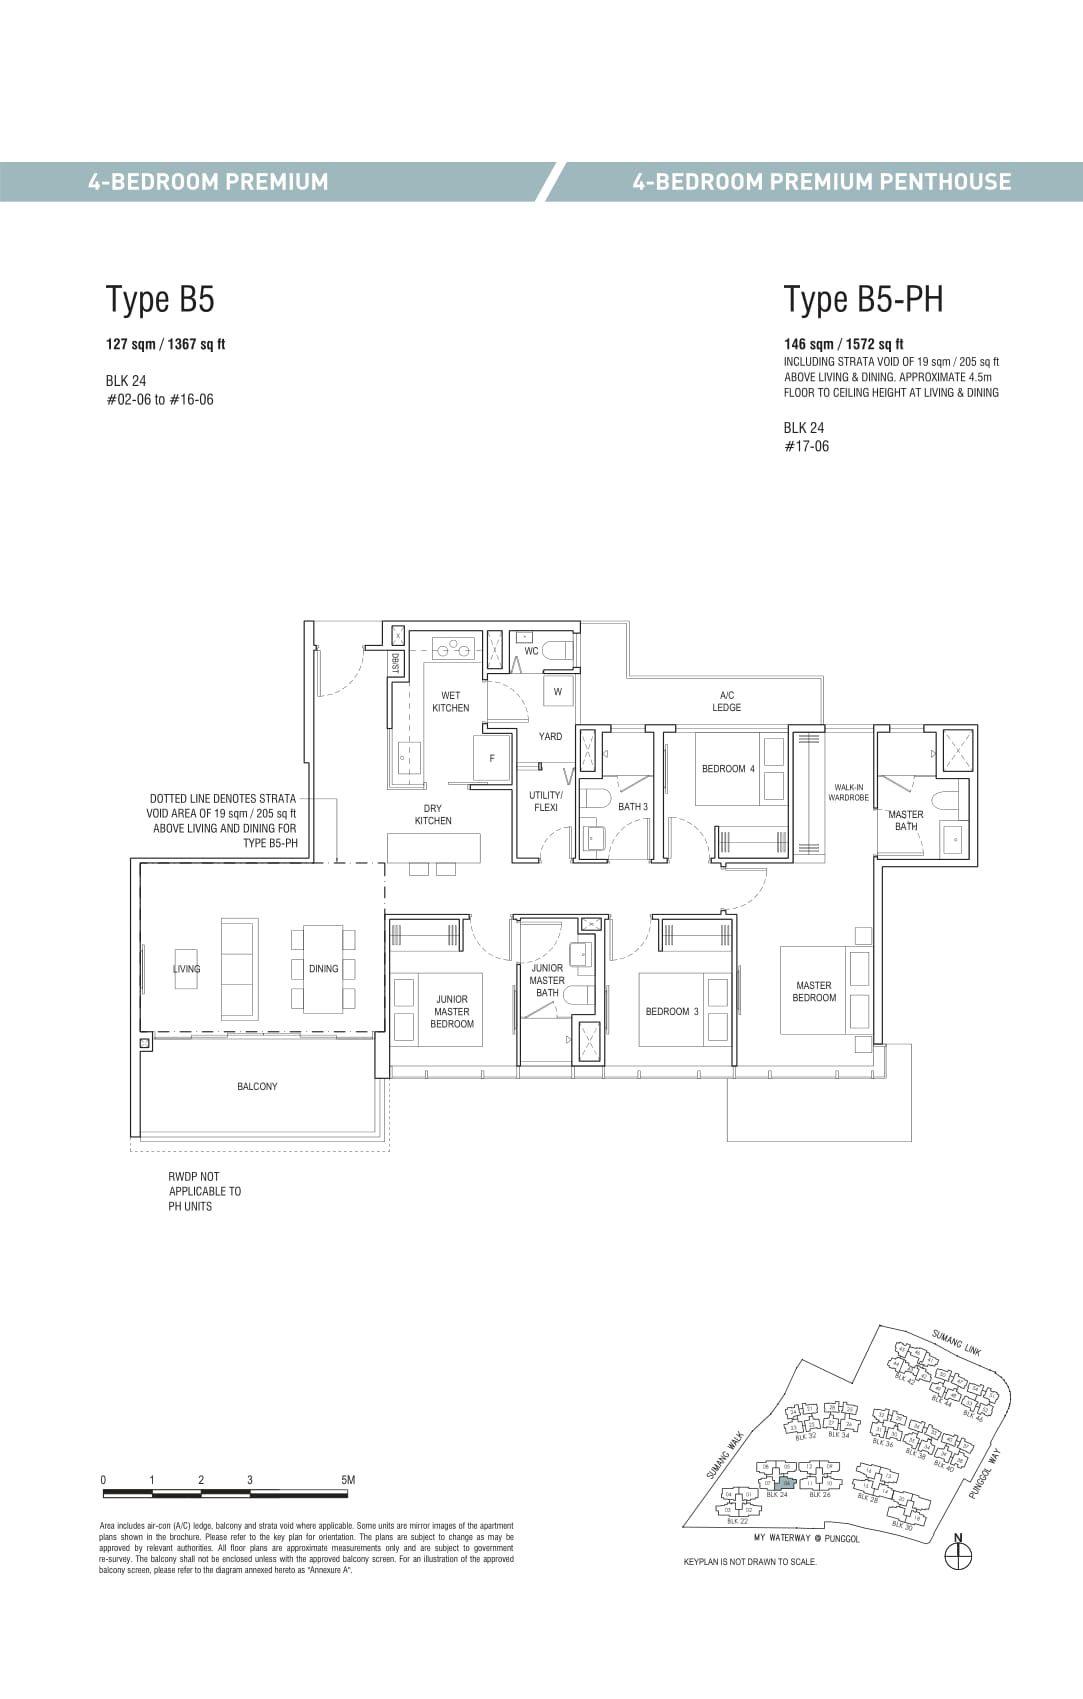 Piermont Grand EC's four-bedroom premium and four-bedroom premium penthouse types